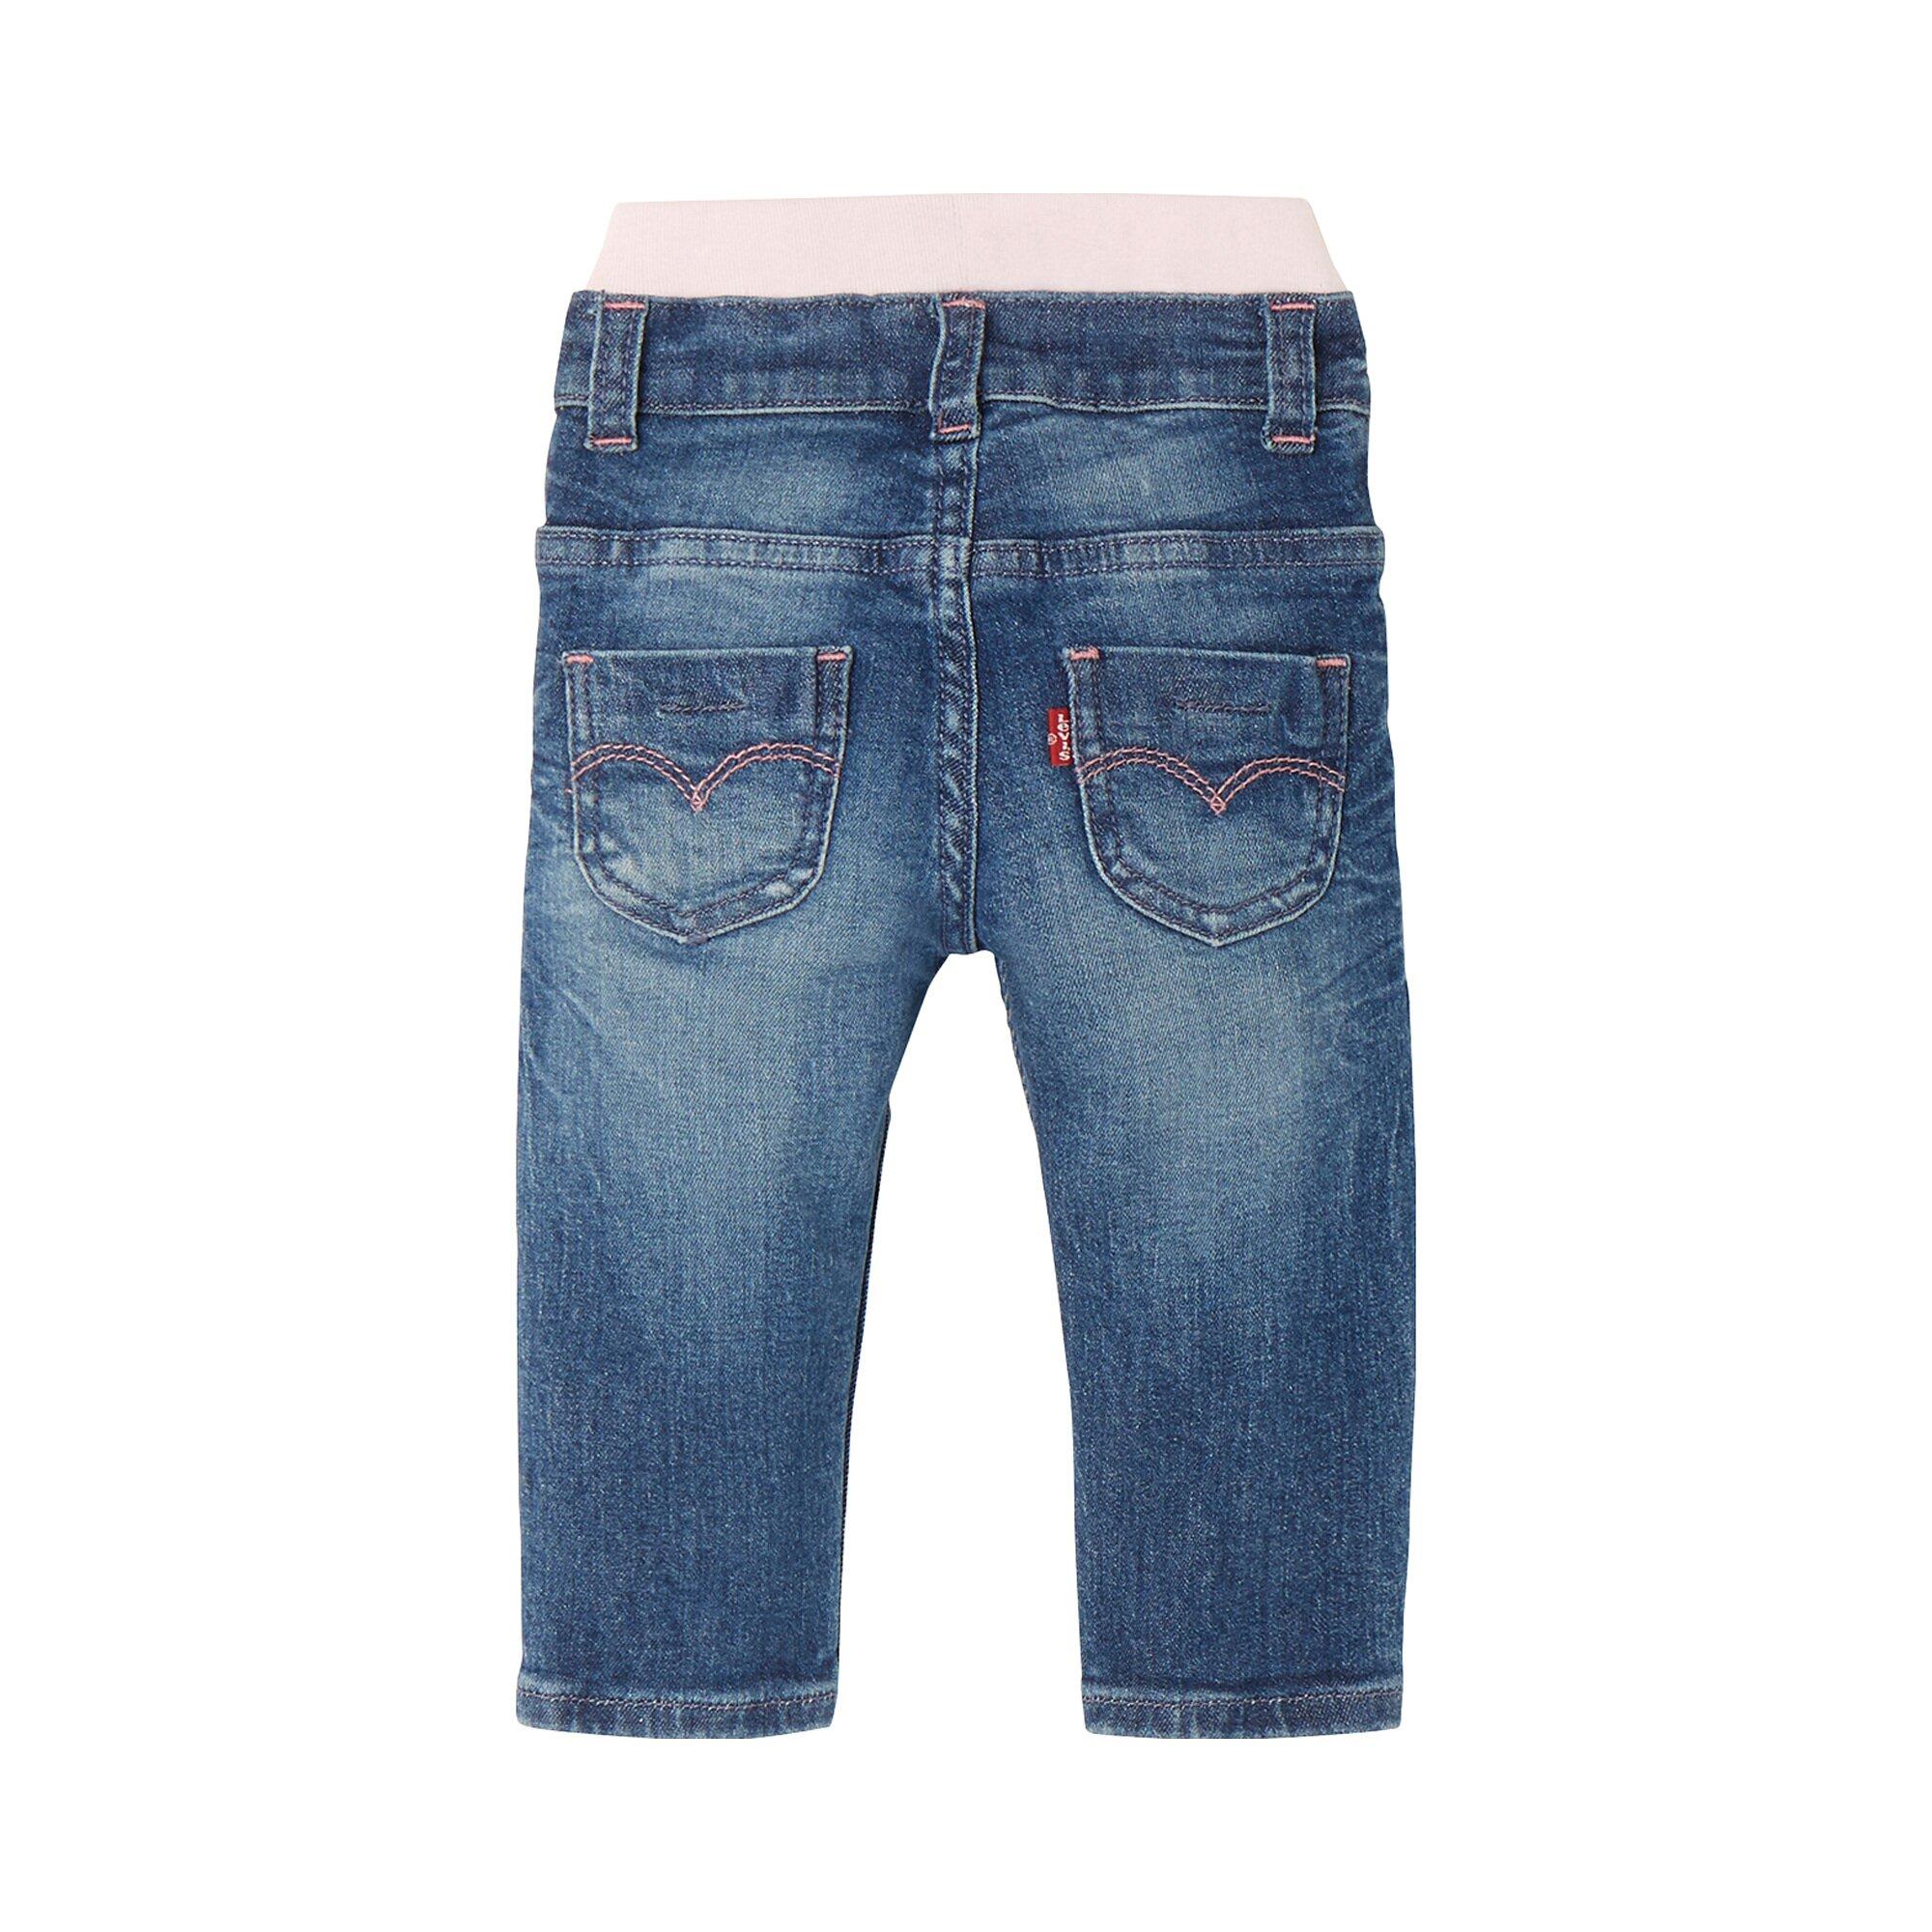 levi-s-kids-jeans-5-pocket